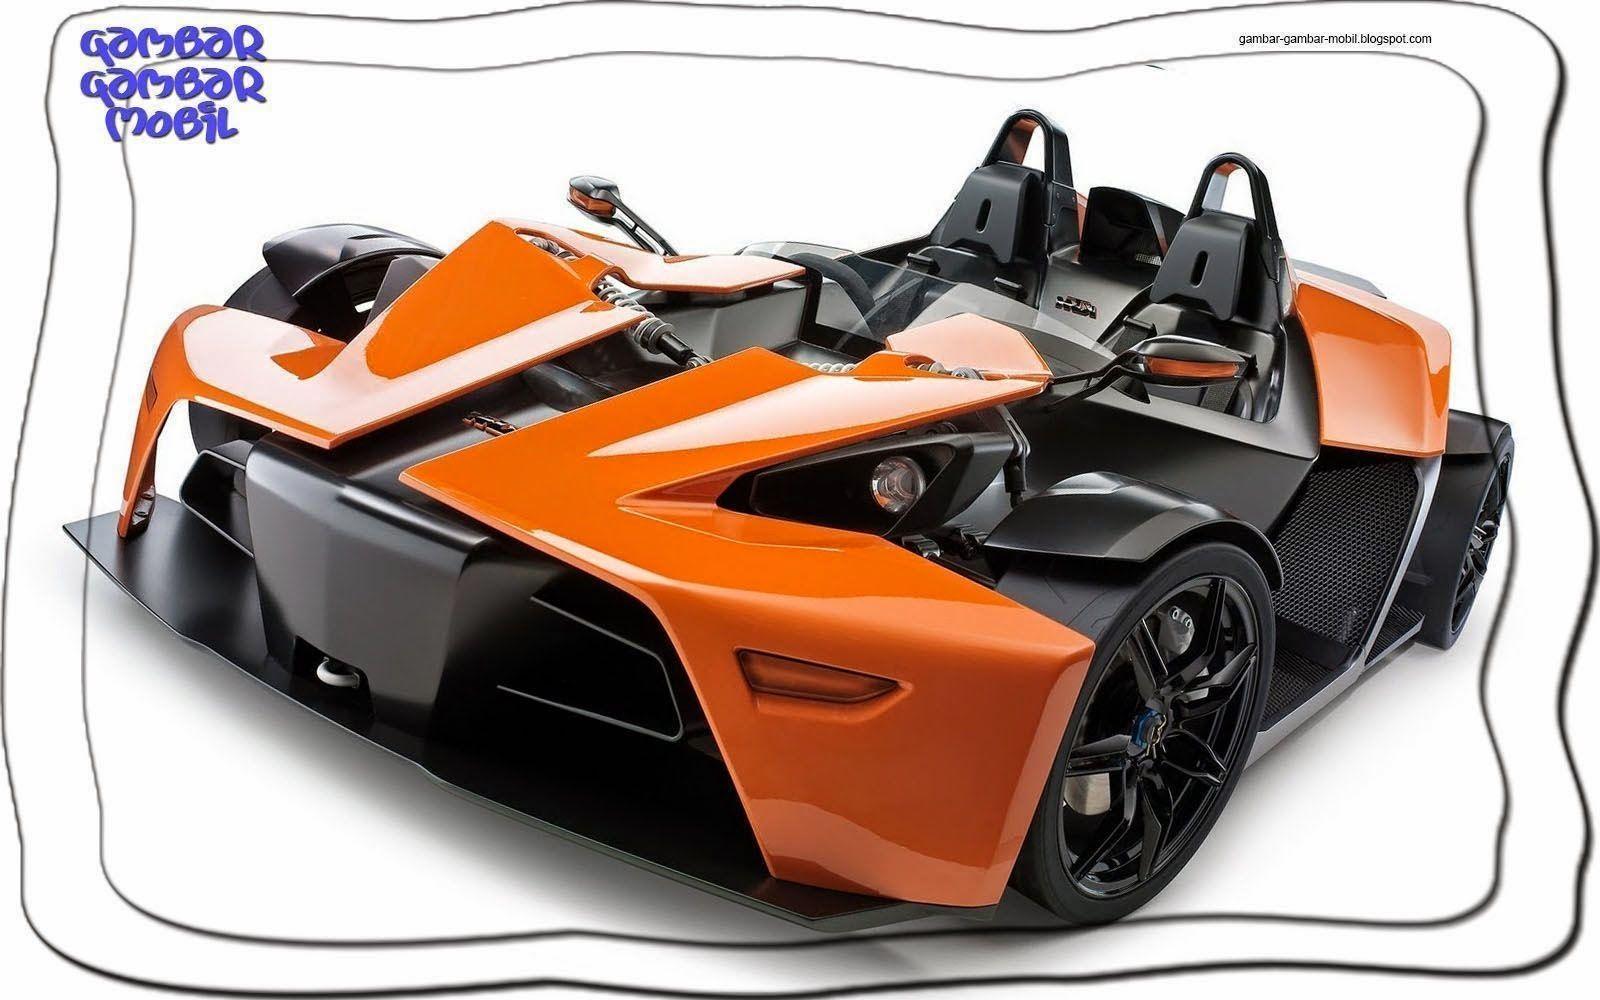 Gambar Mobil Balap Gambar Gambar Mobil Mobil Baru Mobil Balap Supercars